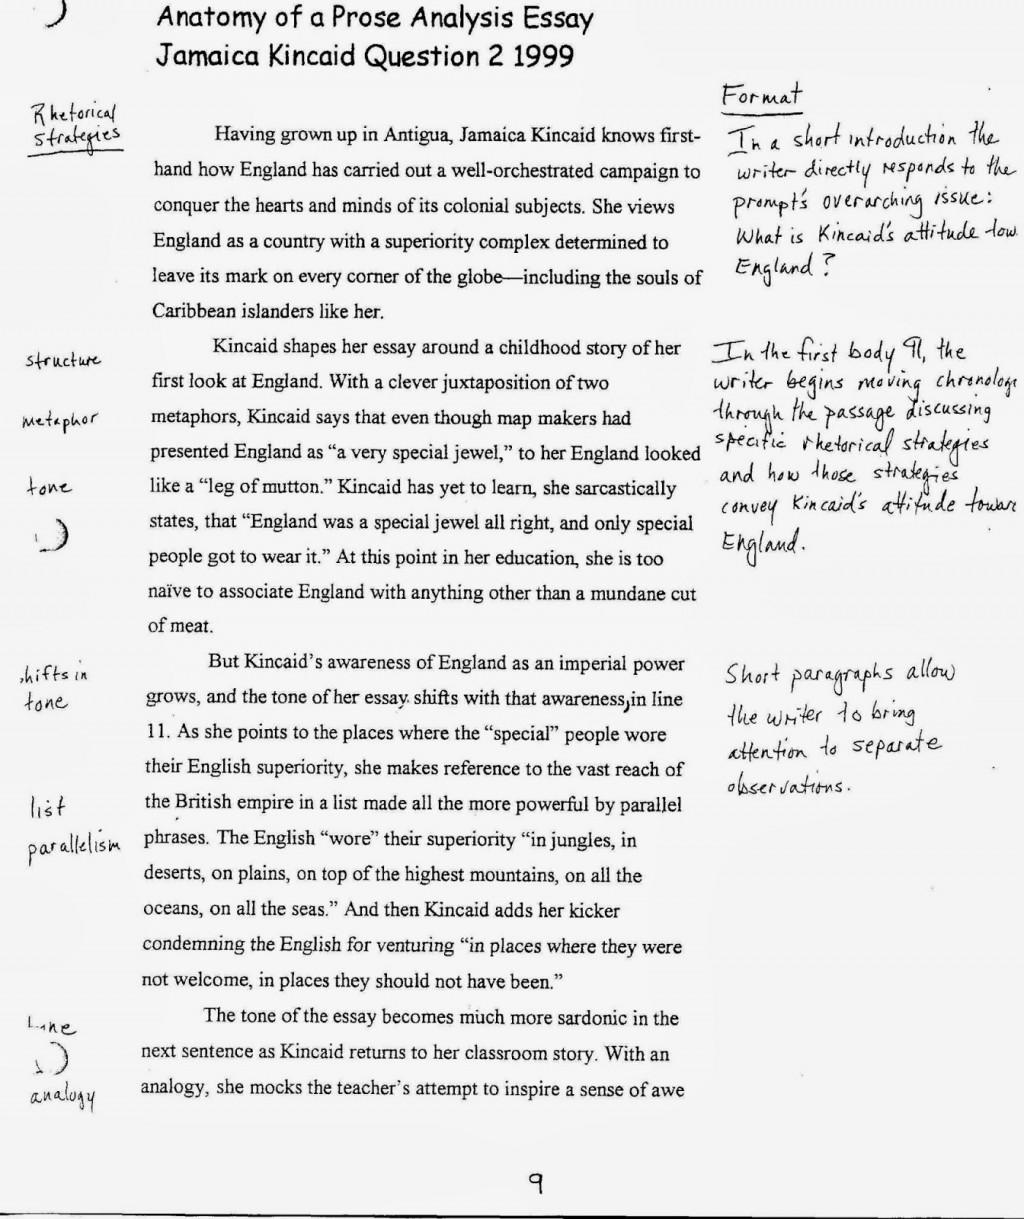 002 Rhetorical Essay Examples Example Of Analysis Essays Goal Blockety Co Using Ethos Pathos And Logo Logos Unusual Ap Lang Strategies Large